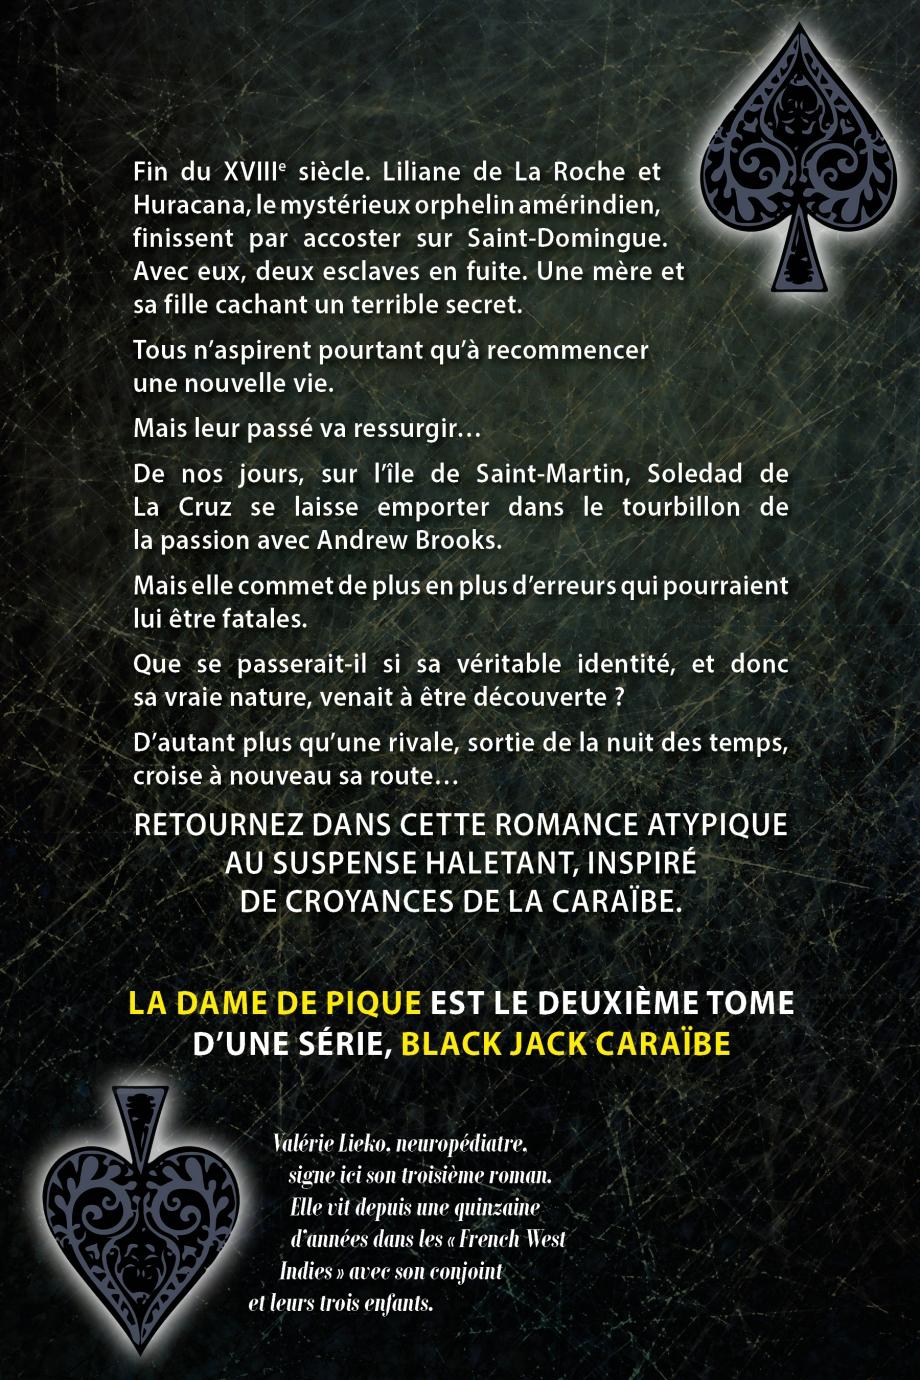 BlackJackCaraïbe-Tome1-Ladamedecœur-C4-6x9.jpg